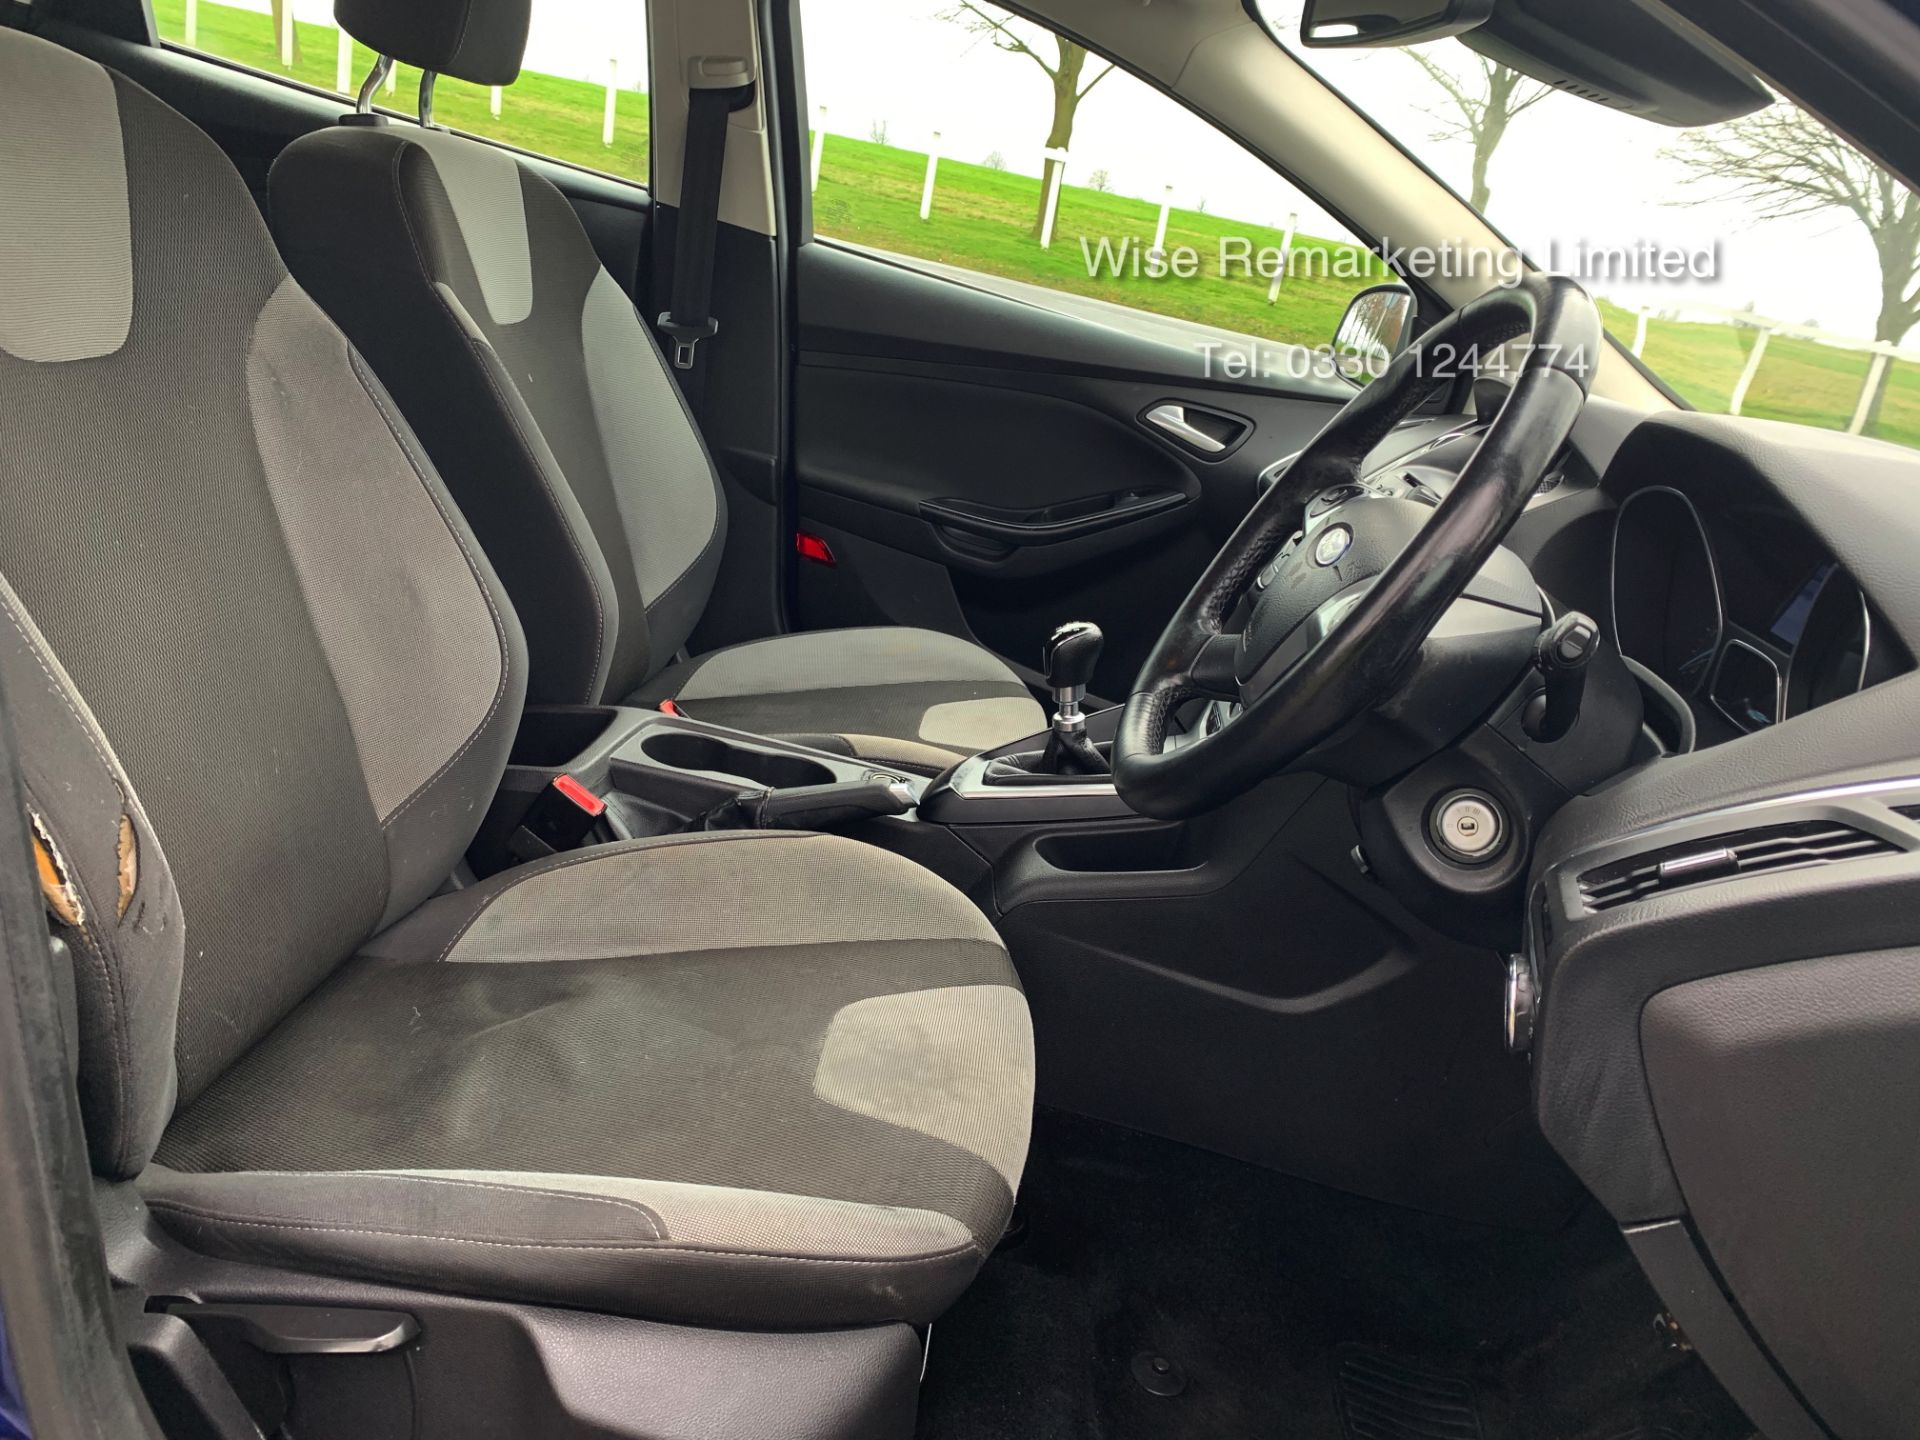 Ford Focus Zetec 1.6 TDCI Econetic - 2015 Model - 6 Speed - - Image 13 of 20